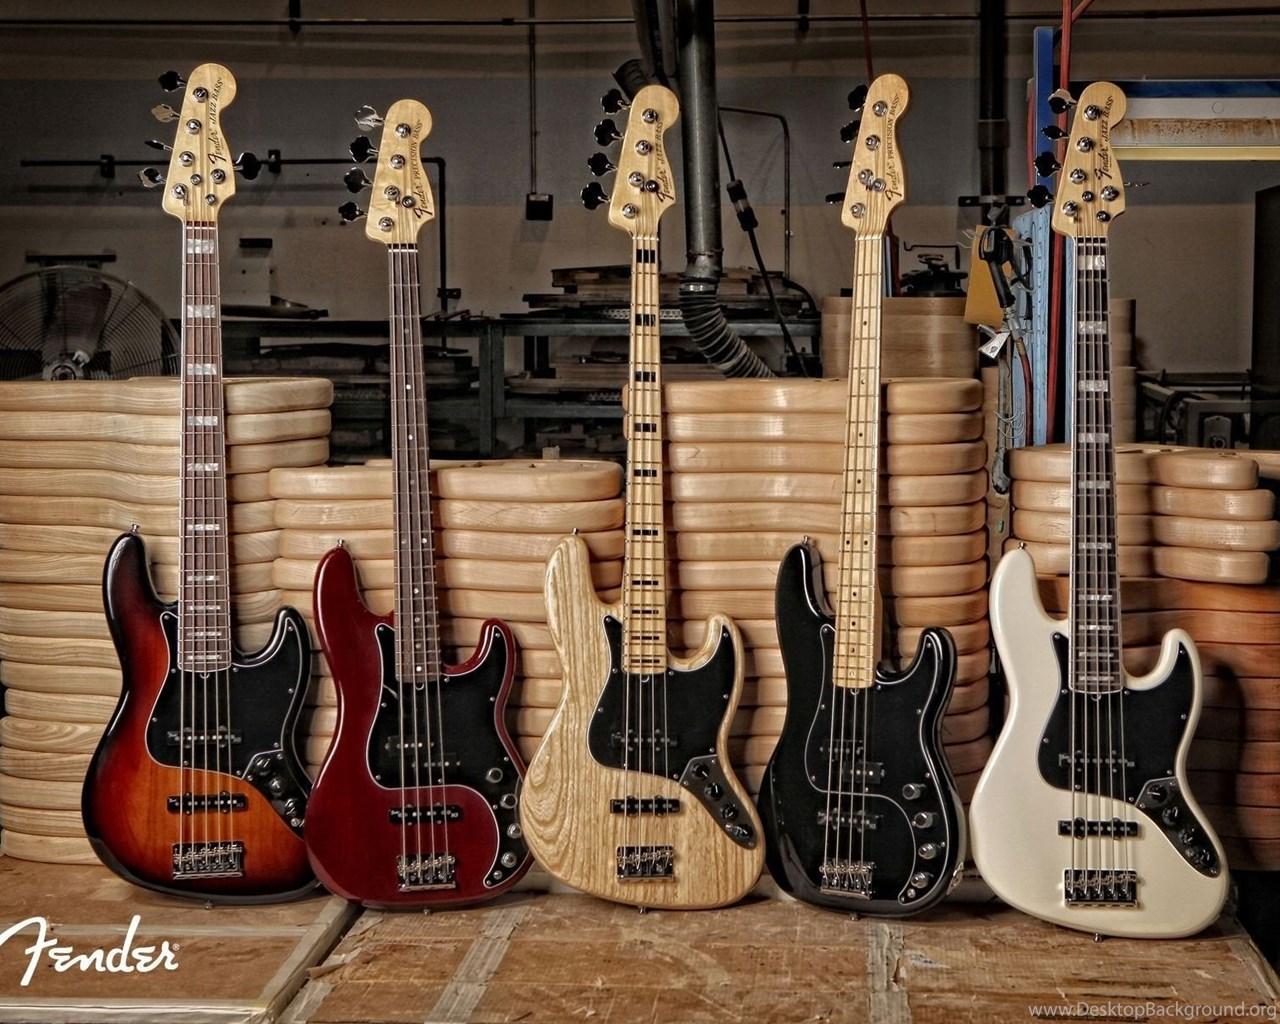 Fender Guitar Photography Music Wallpapers Hd D Desktop Background